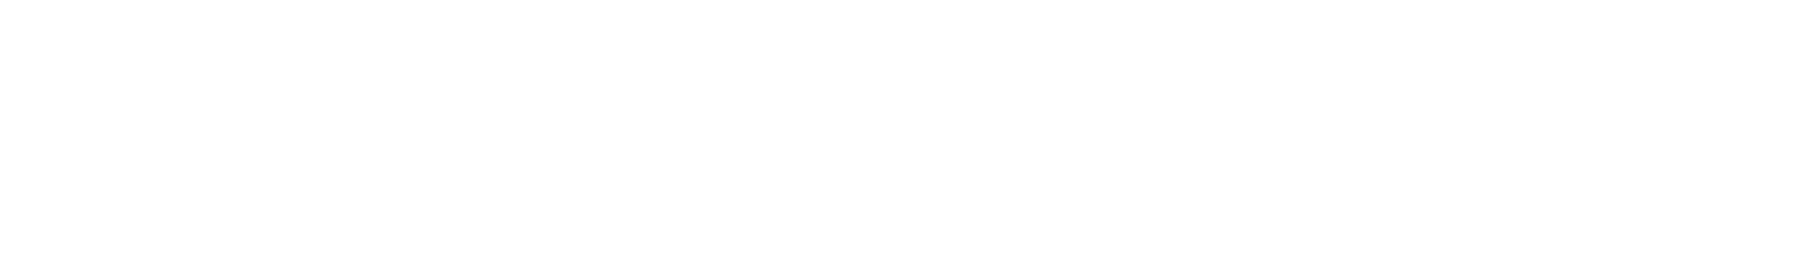 150bpm trapbeat